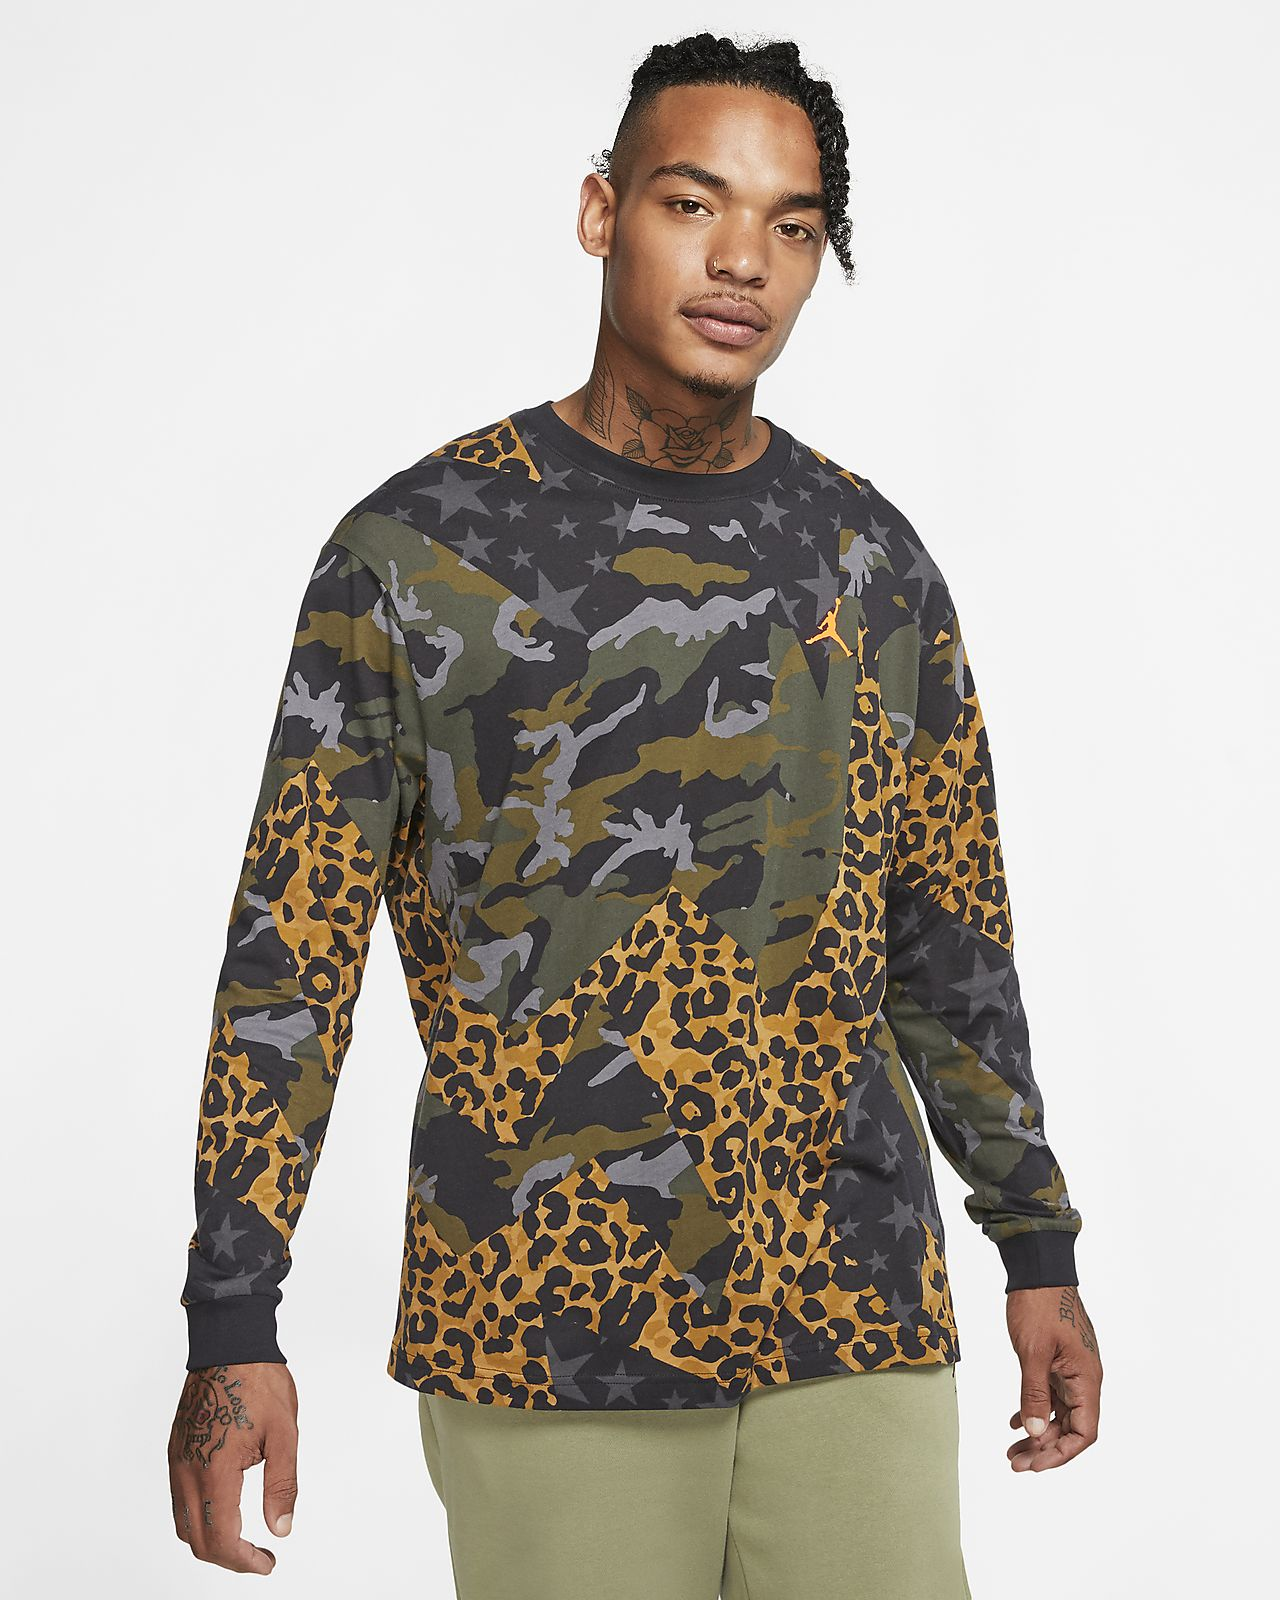 Jordan Animal Instinct Men's Long-Sleeve T-Shirt